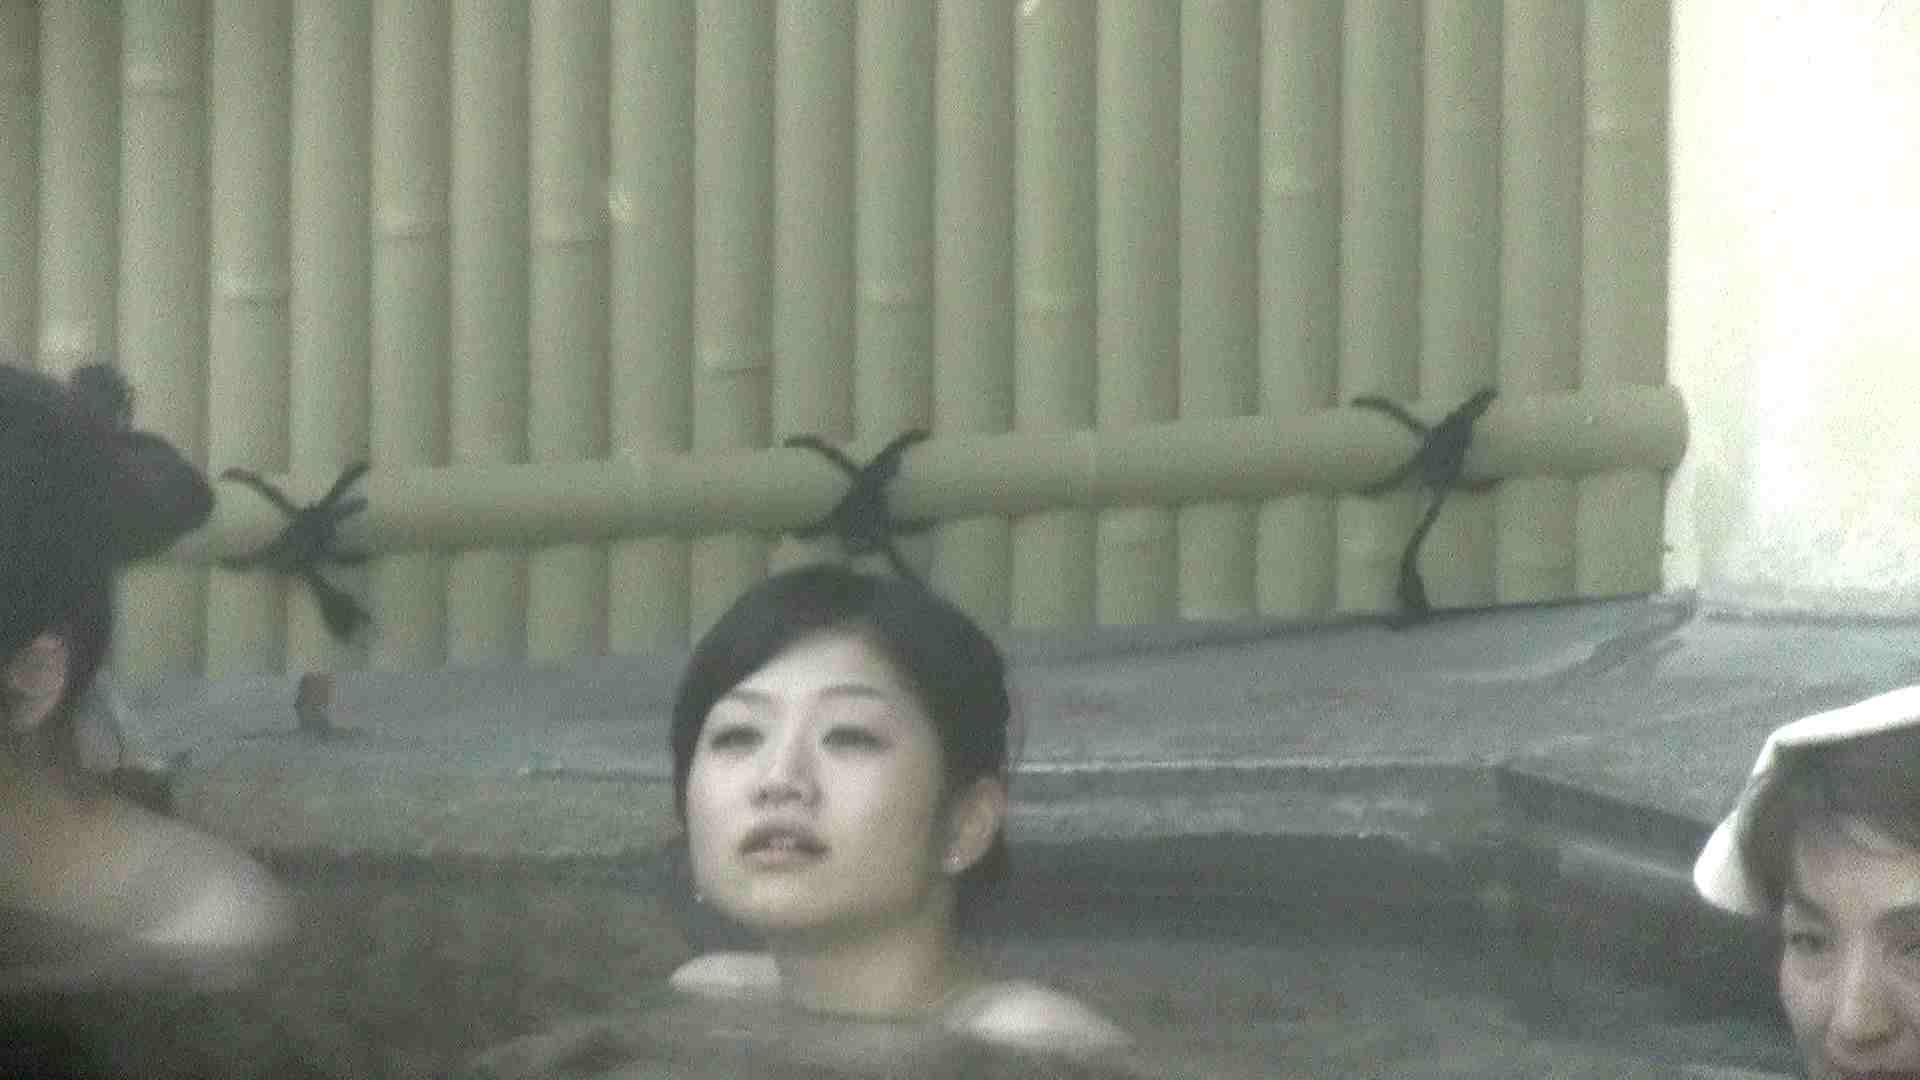 Aquaな露天風呂Vol.206 露天 | HなOL  74pic 25